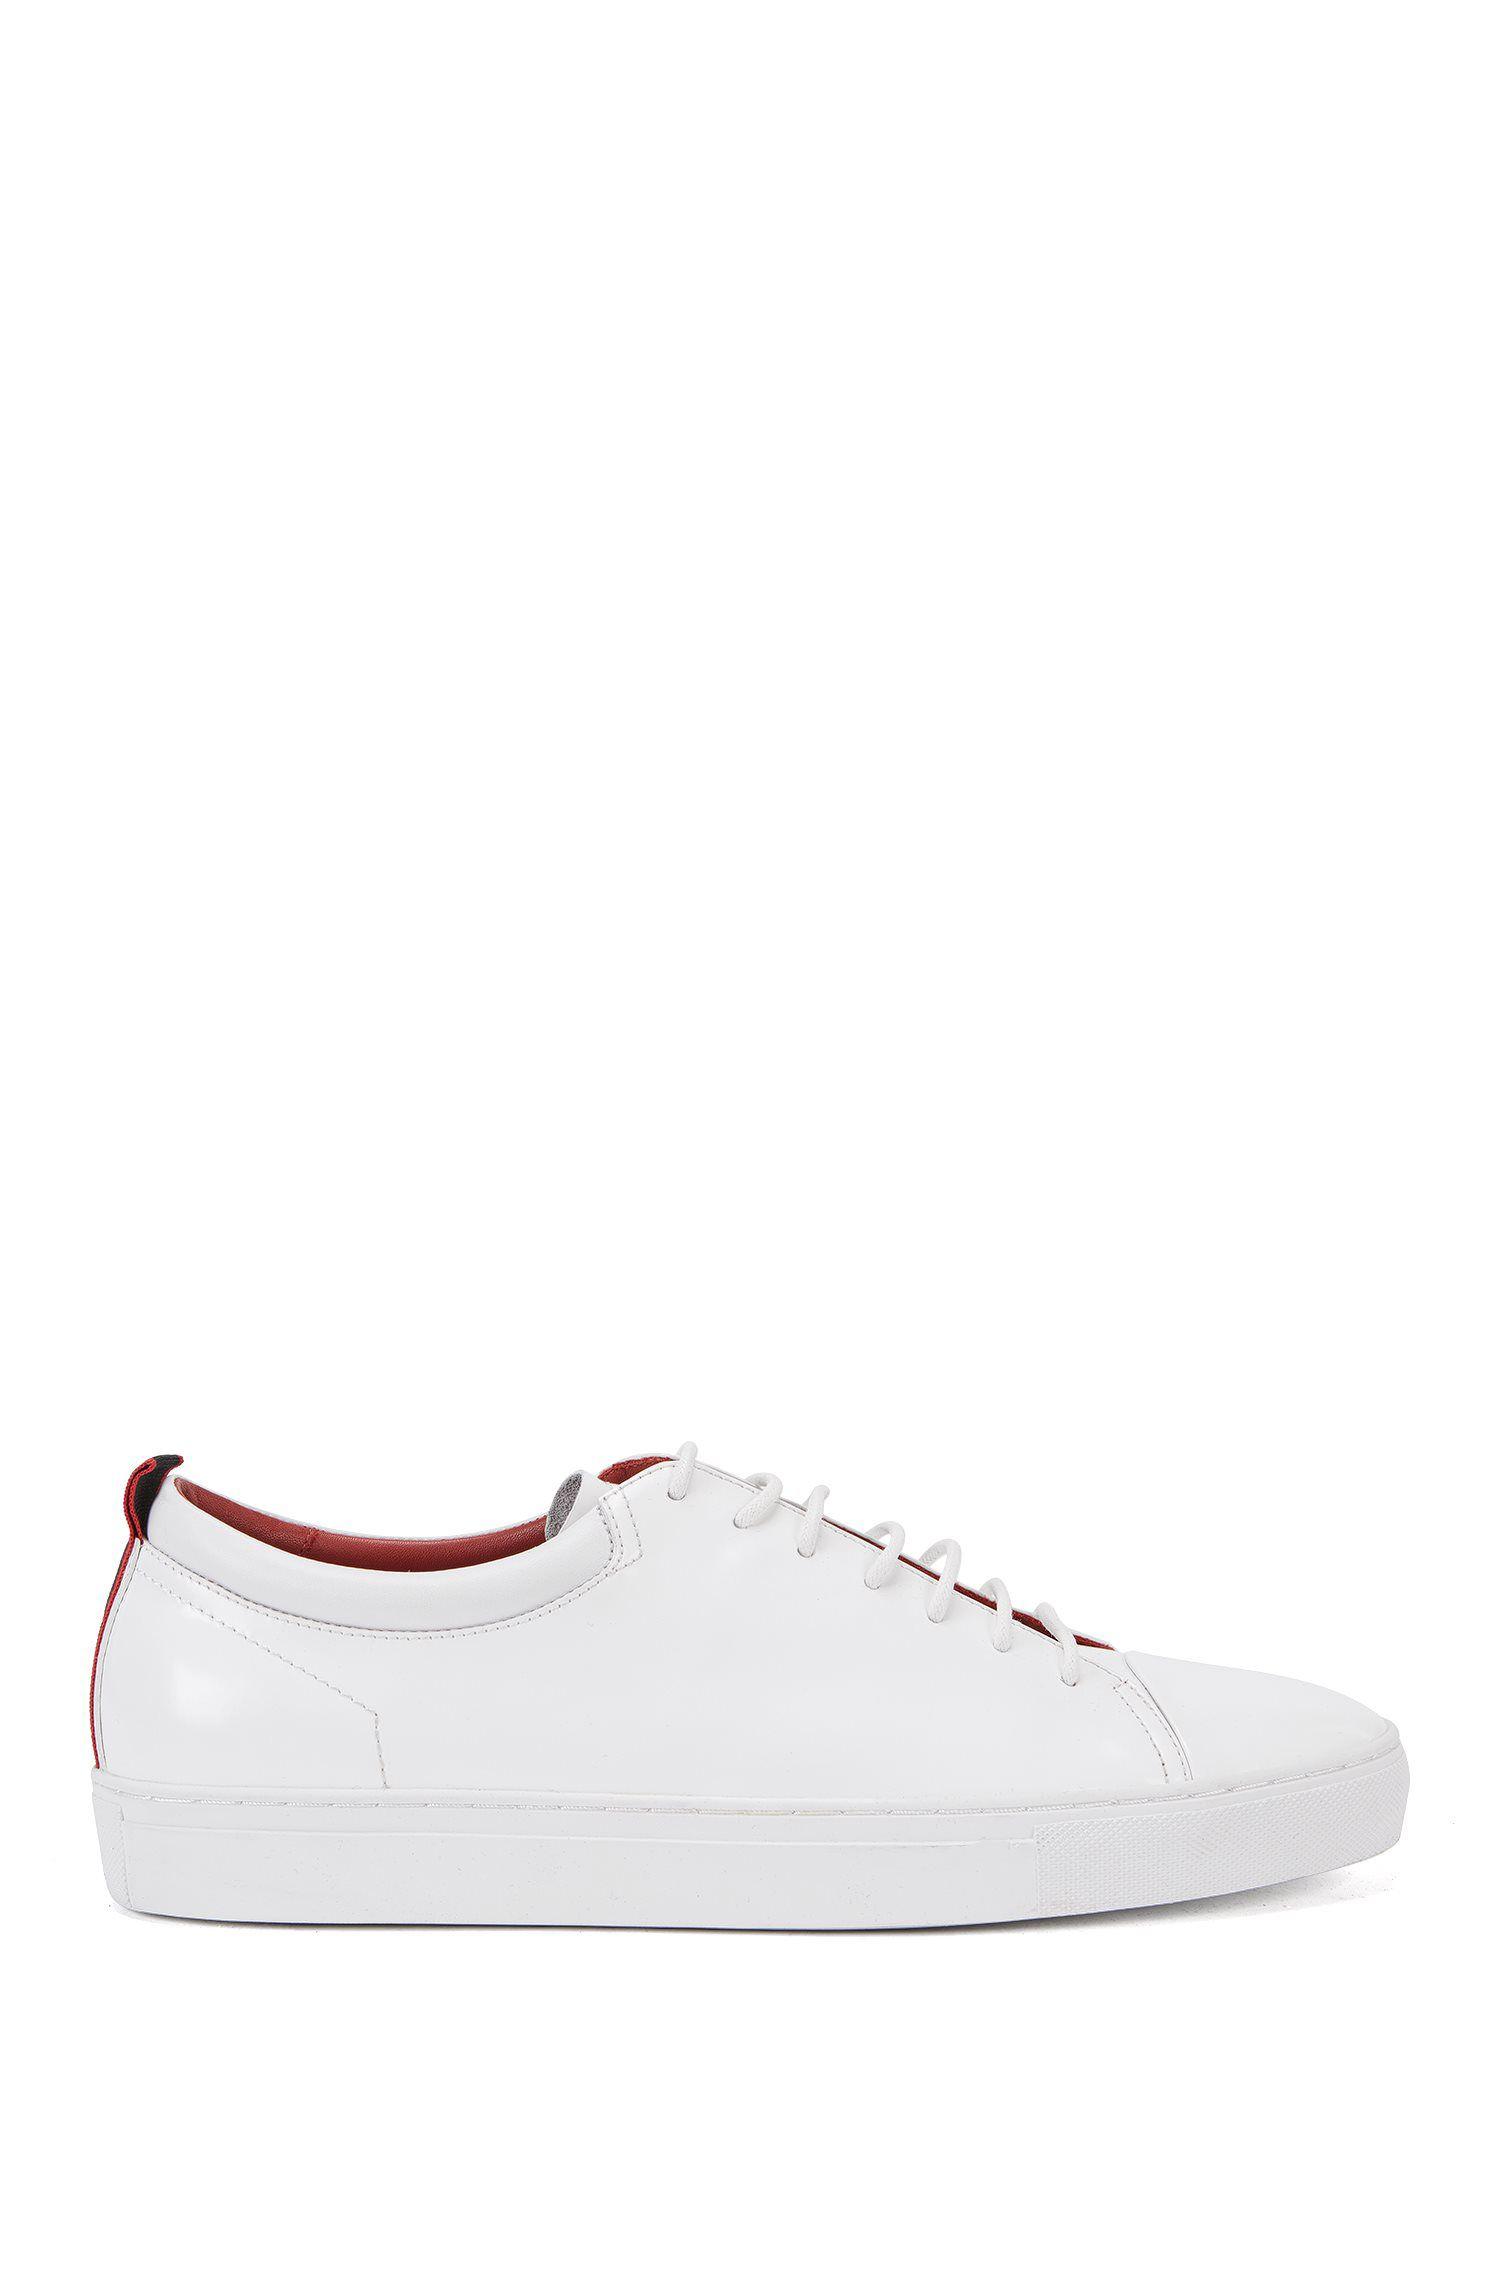 Leather Tennis Shoes | Casual Fut Tenn Boct